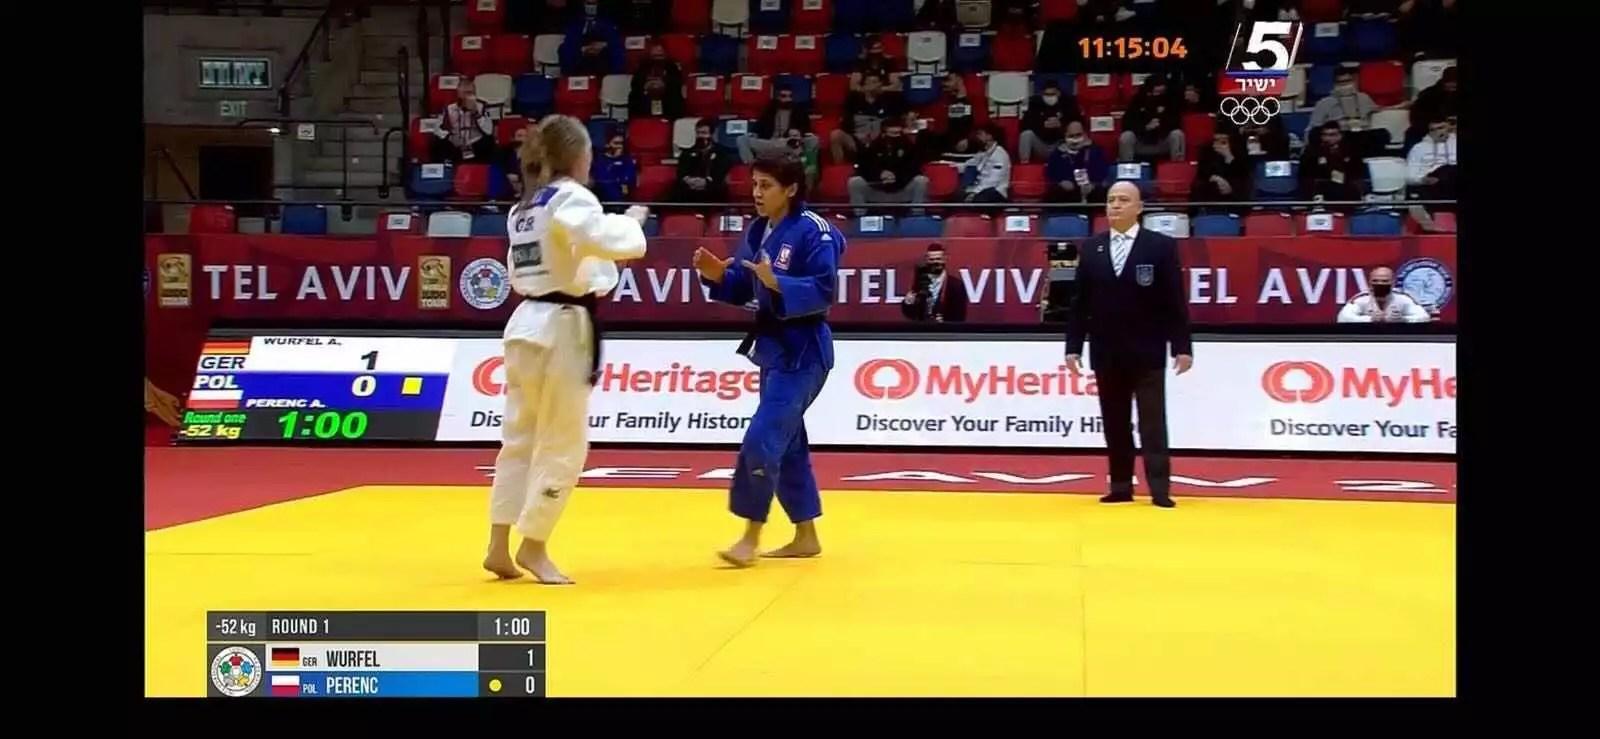 MyHeritage sponsors the Tel Aviv Judo Grand Slam 2021 Tournament [Credit; MyHeritage]